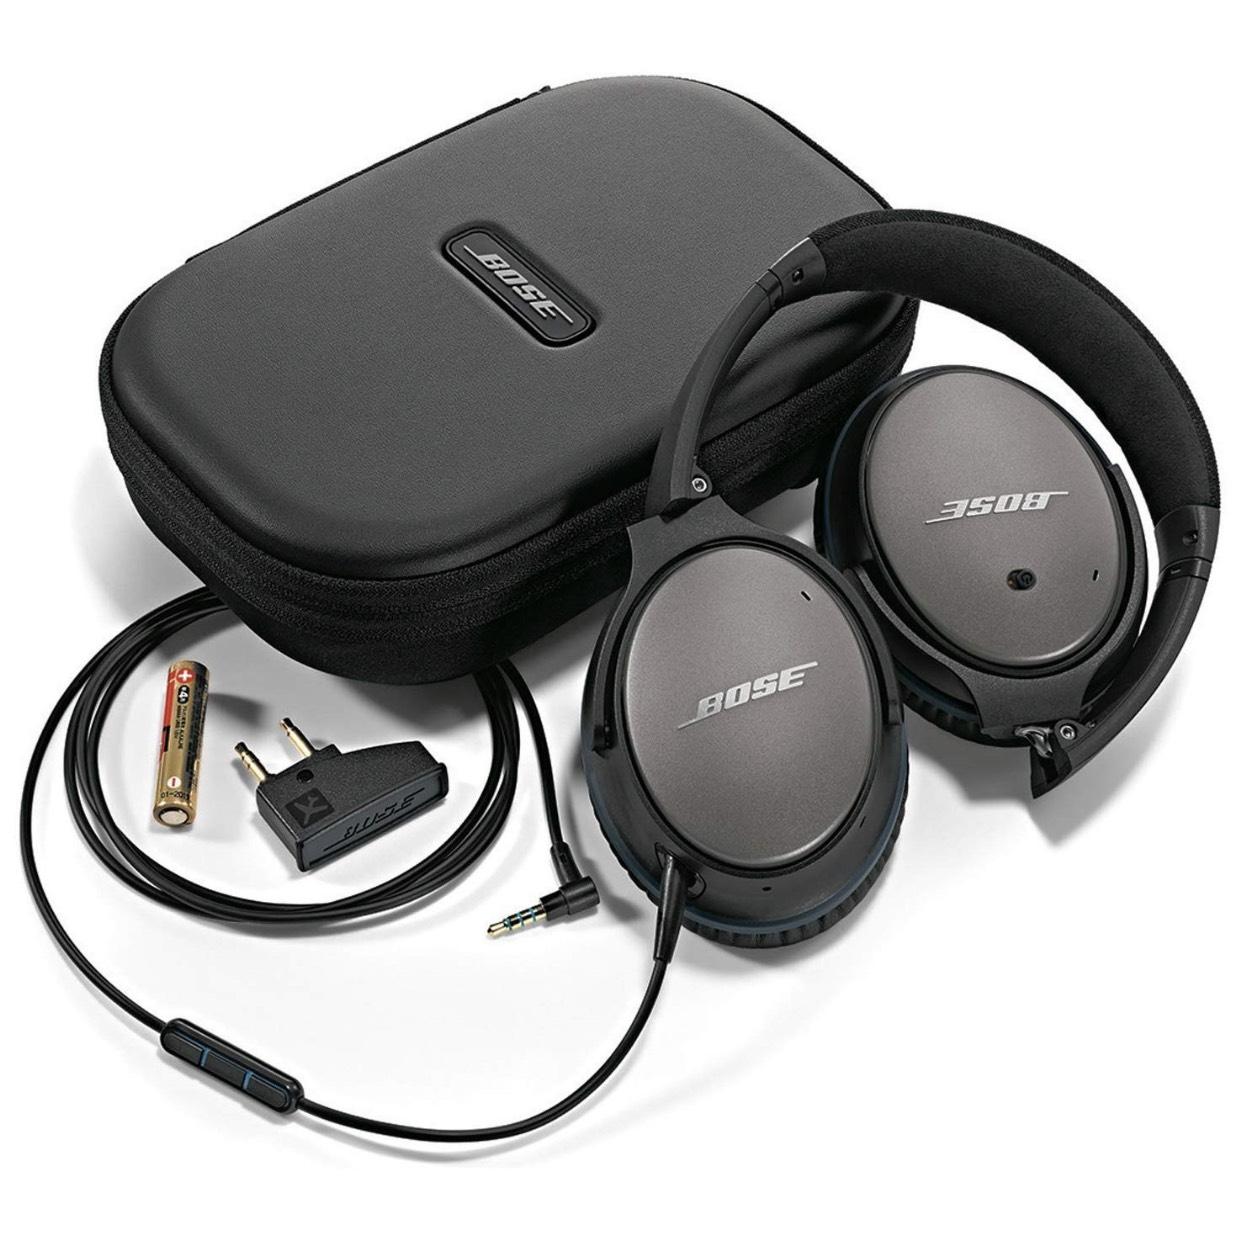 Bose QuietComfort 25 Acoustic Noise Cancelling Kopfhörer (geeignet für Apple-Geräte)